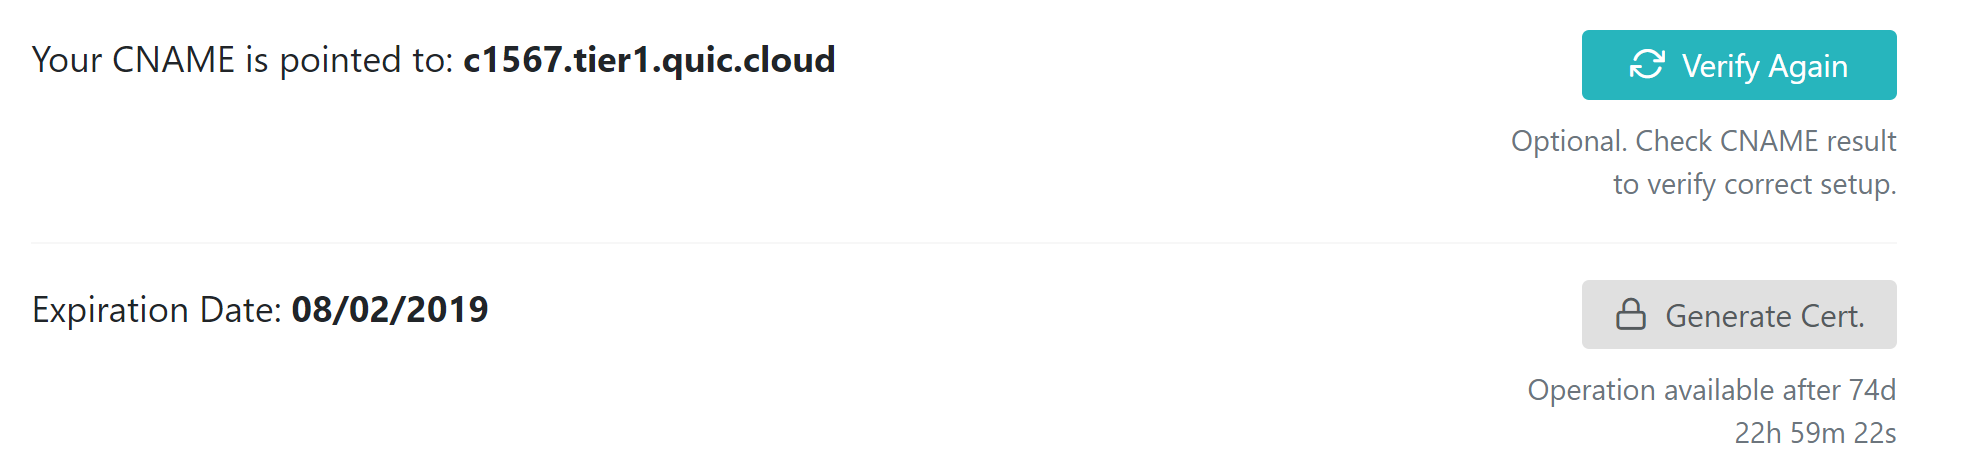 QUIC.Cloud - LiteSpeed 出品的WP优化版全站CDN解决方案-米饭粑